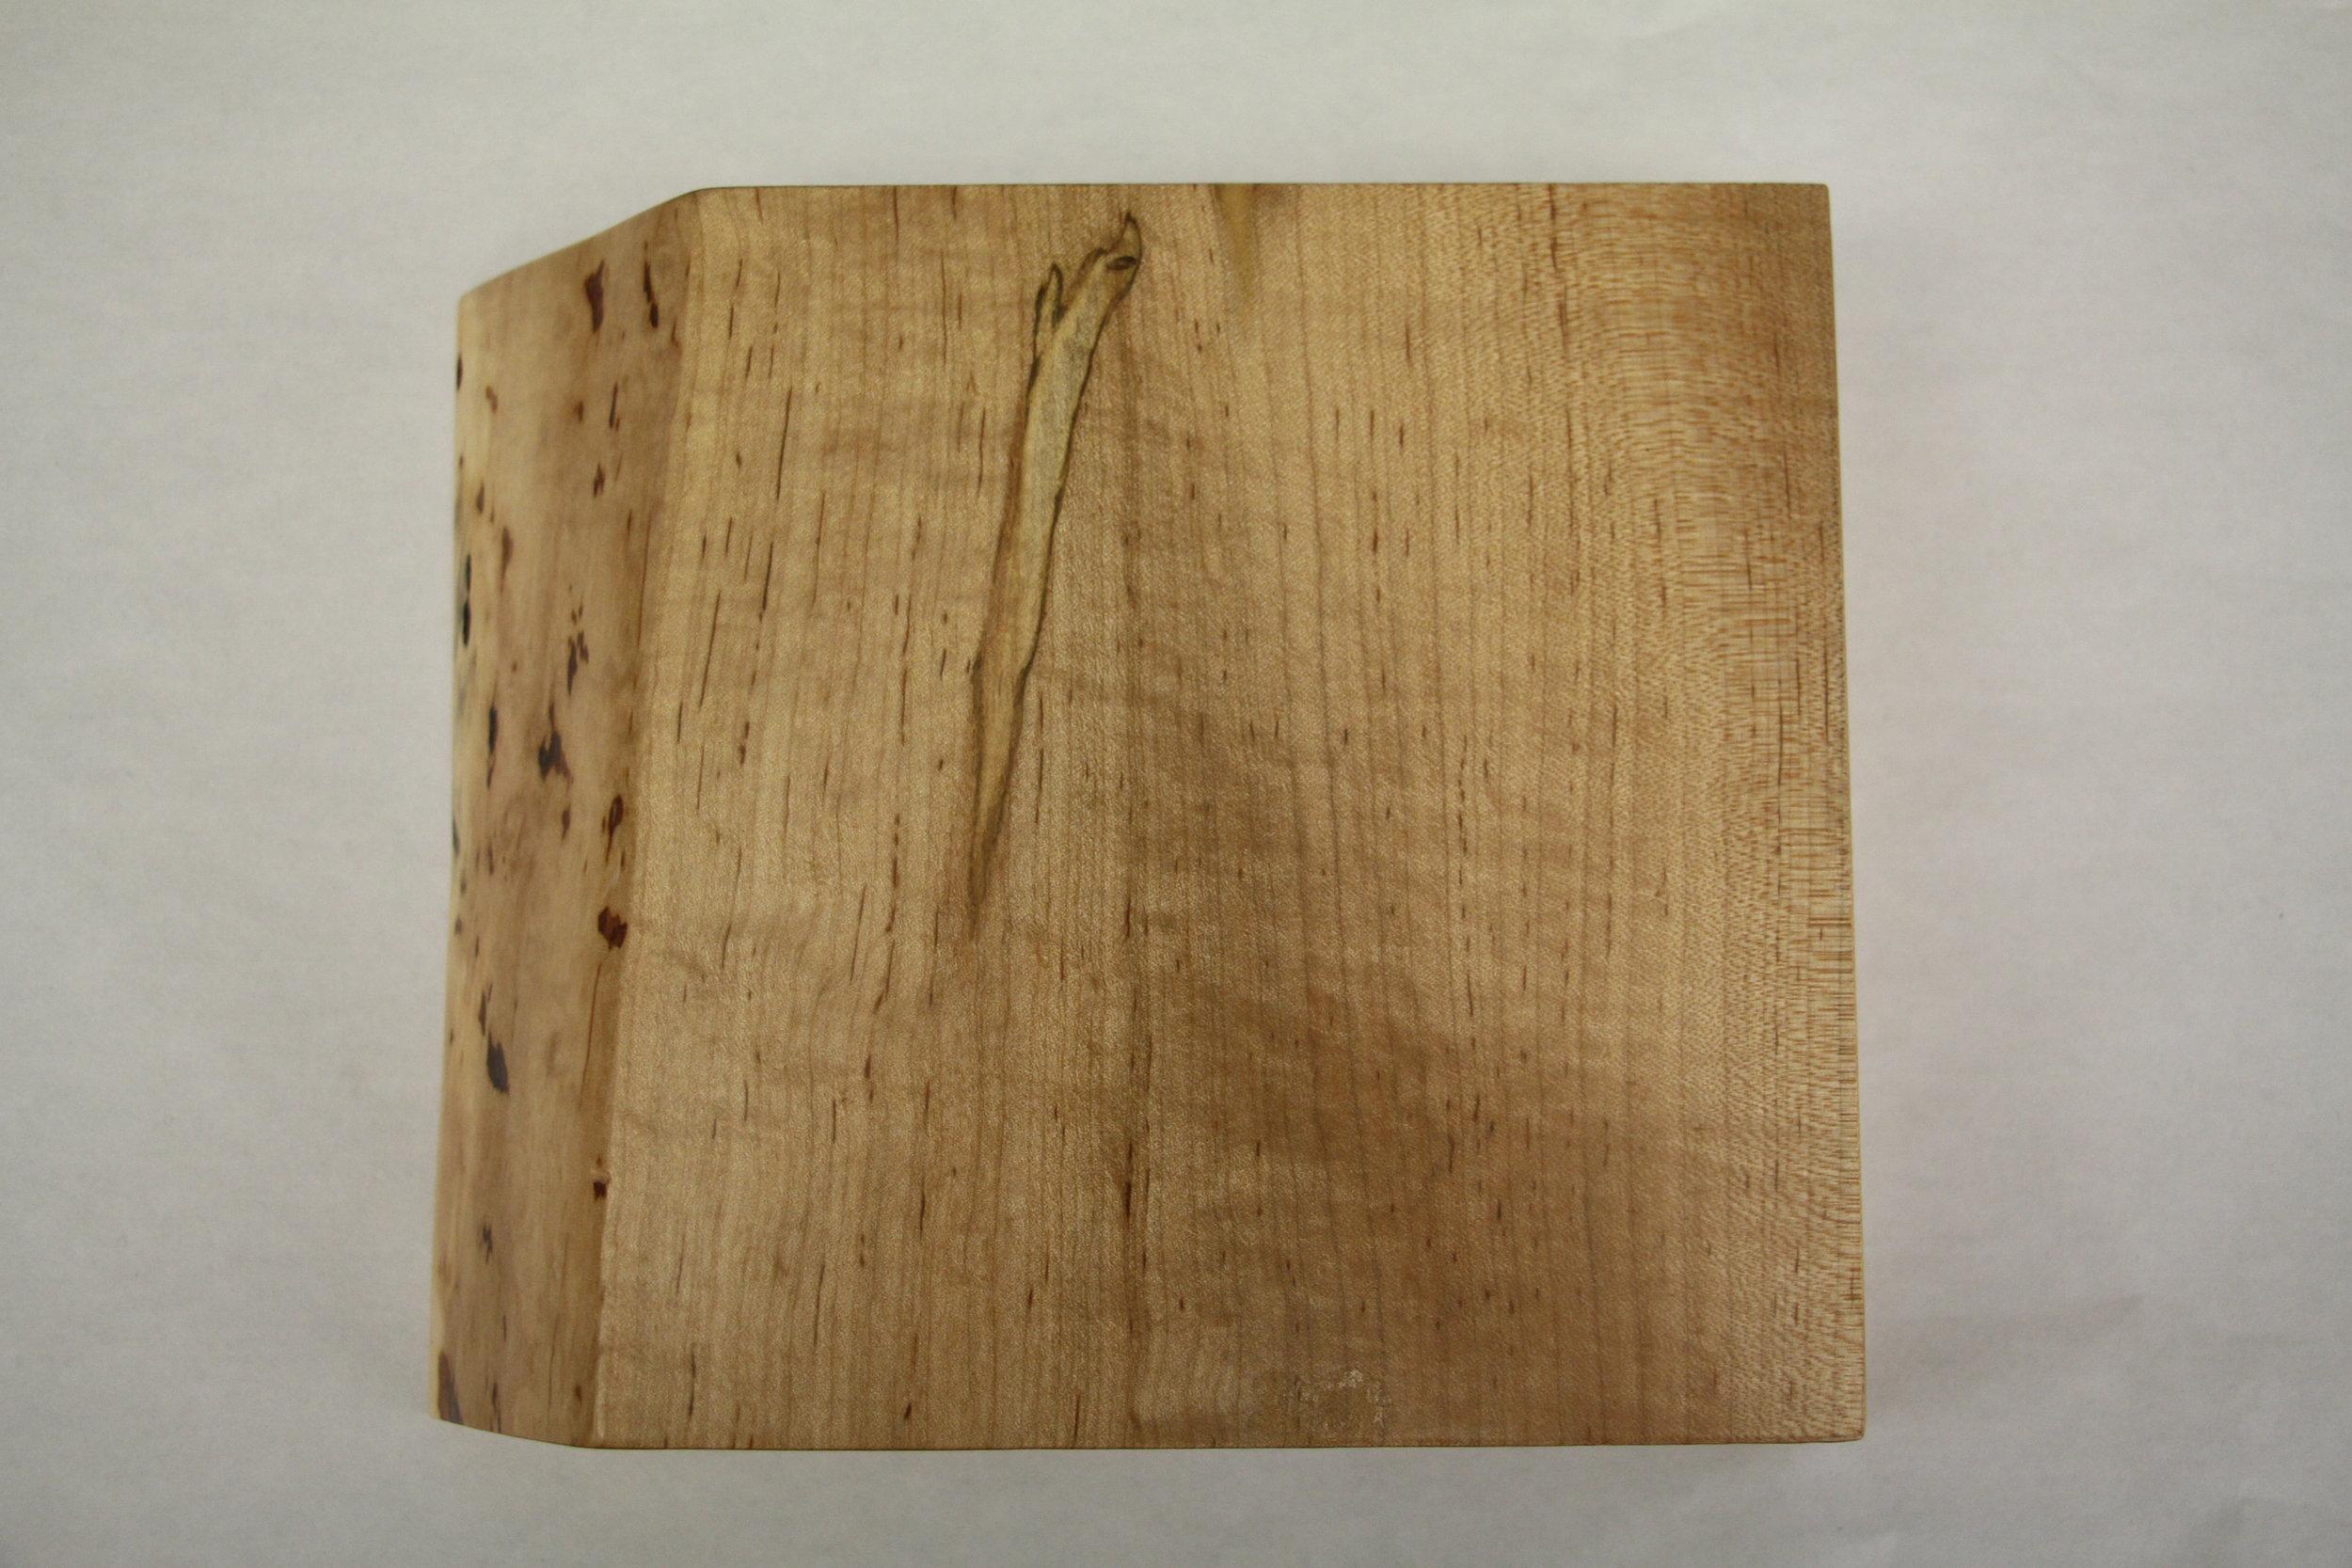 Ambrosia maple / live edge / natural / polyurethane / satin